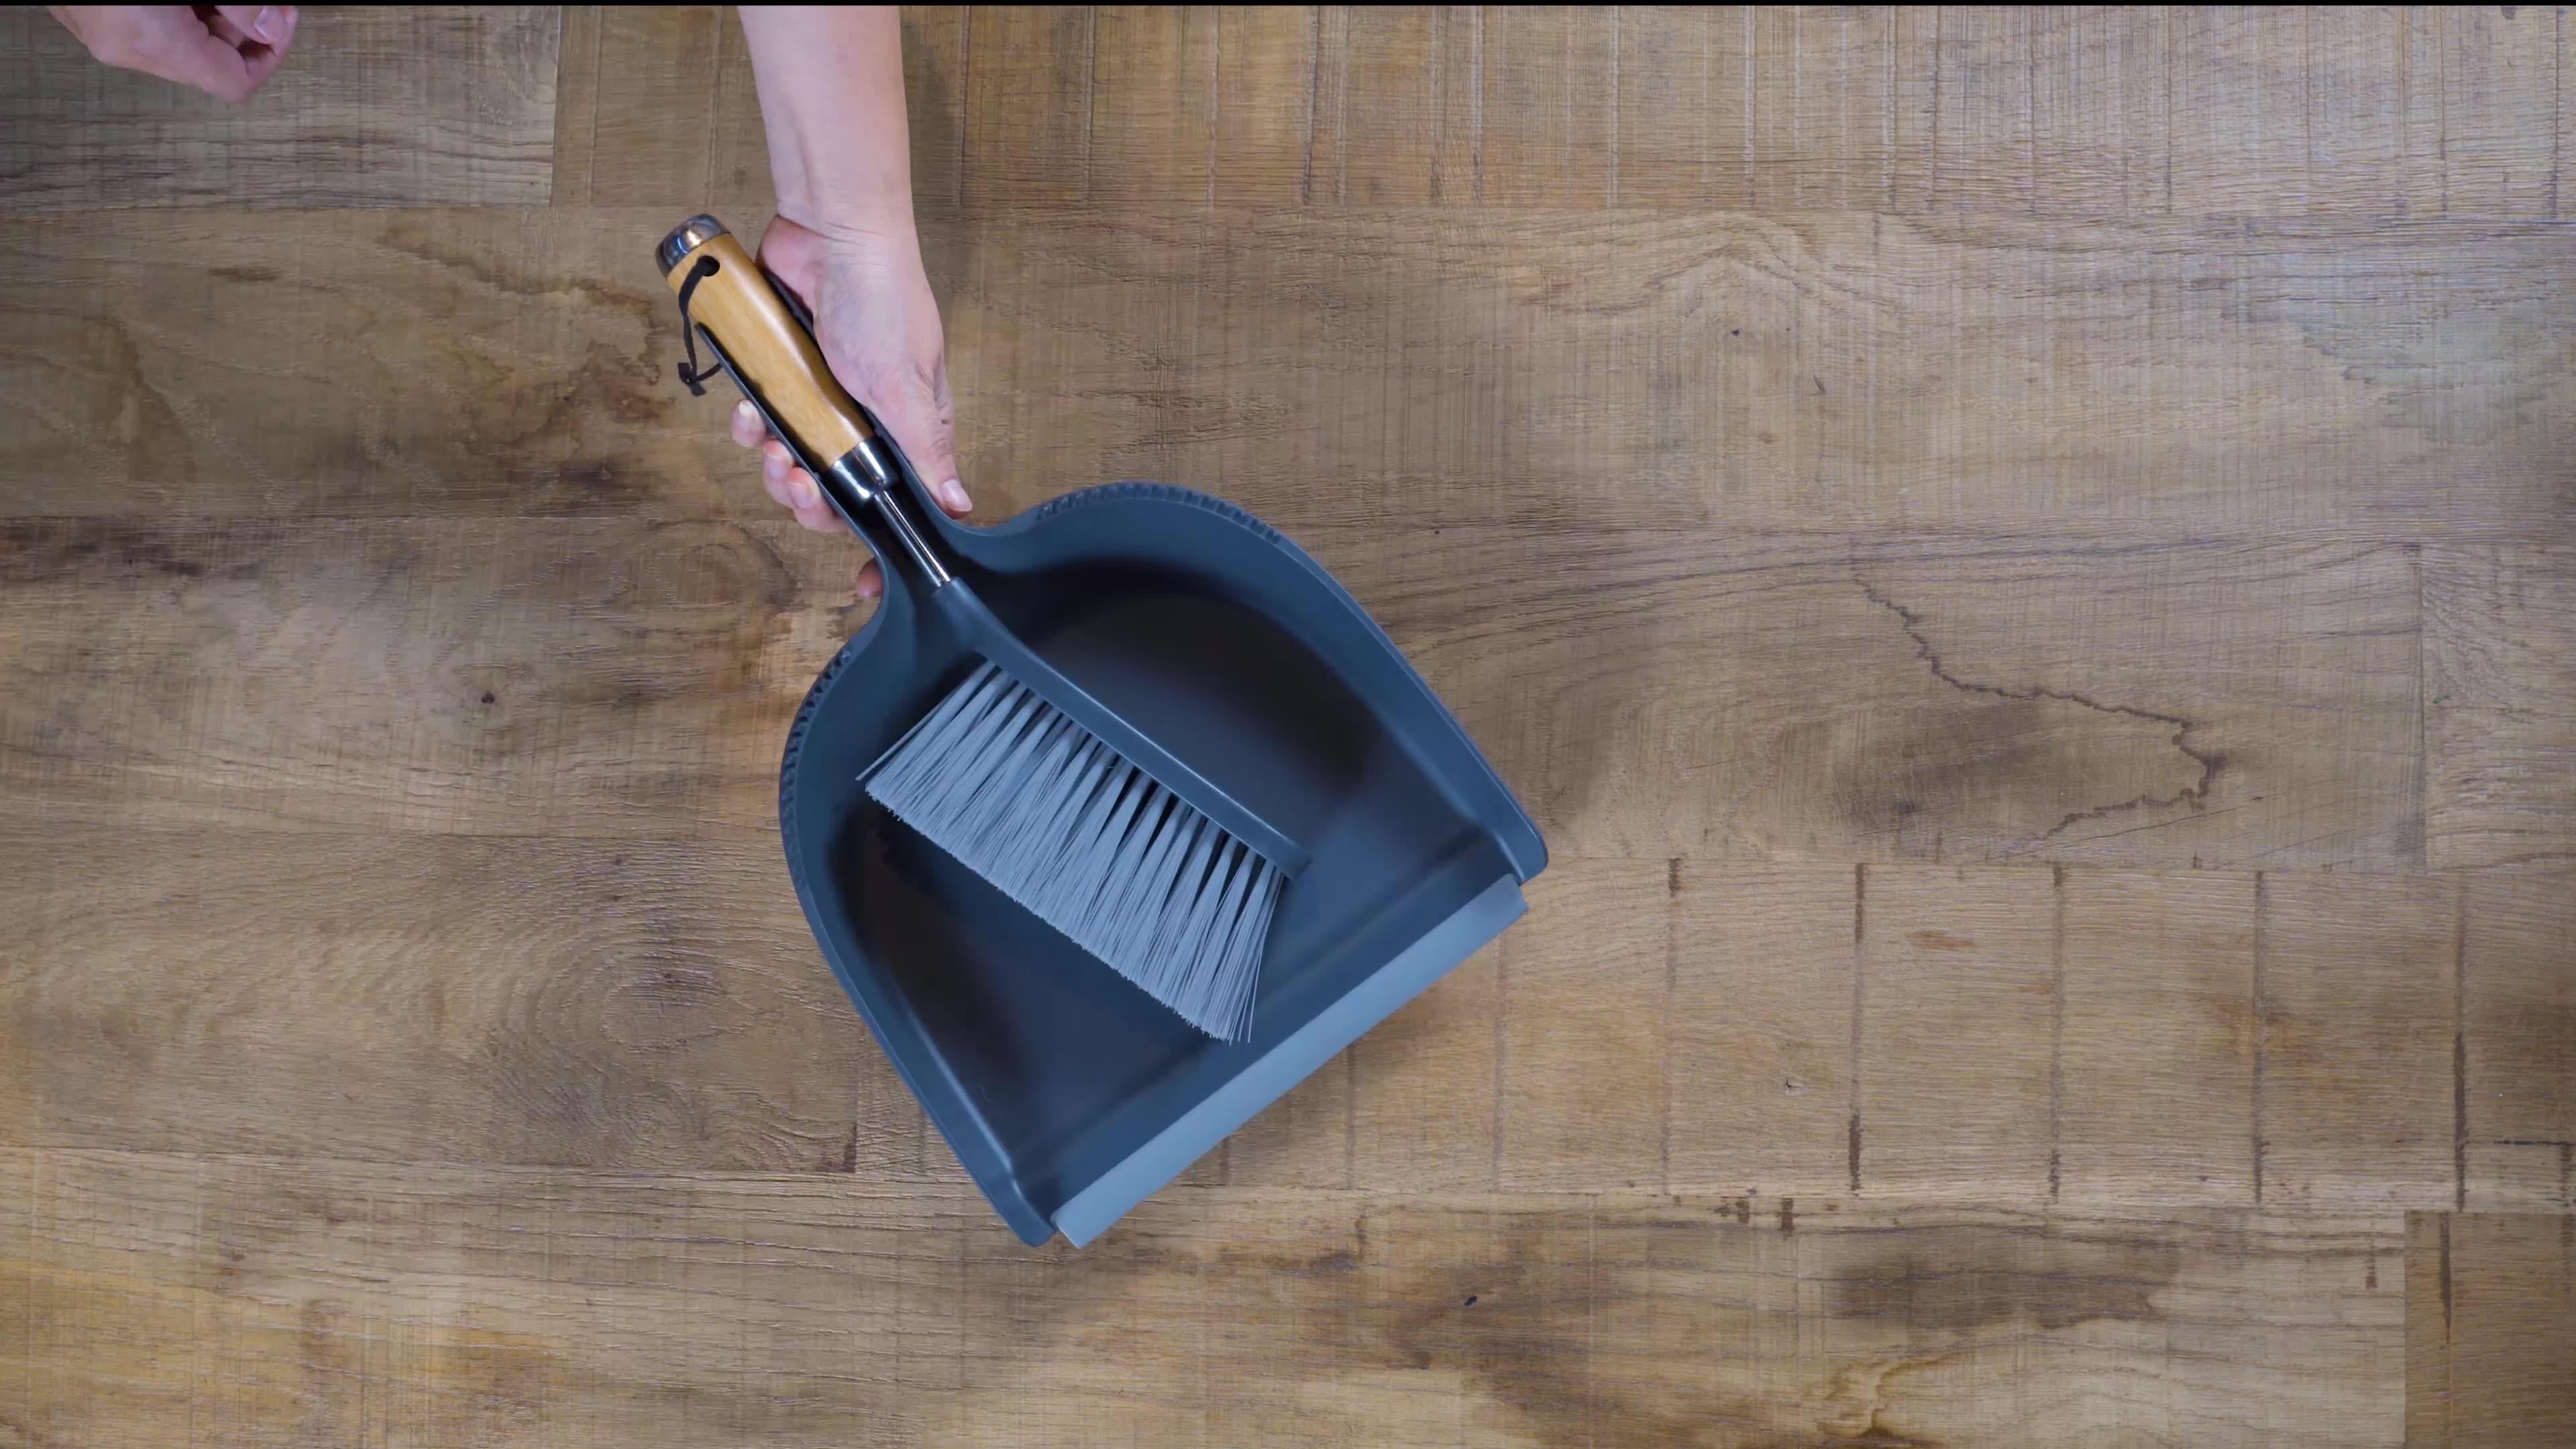 Masthome eco friendly Bamboo table broom Handle Desktop Sweep Cleaning Brush Stainless Steel Broom Dustpan Set